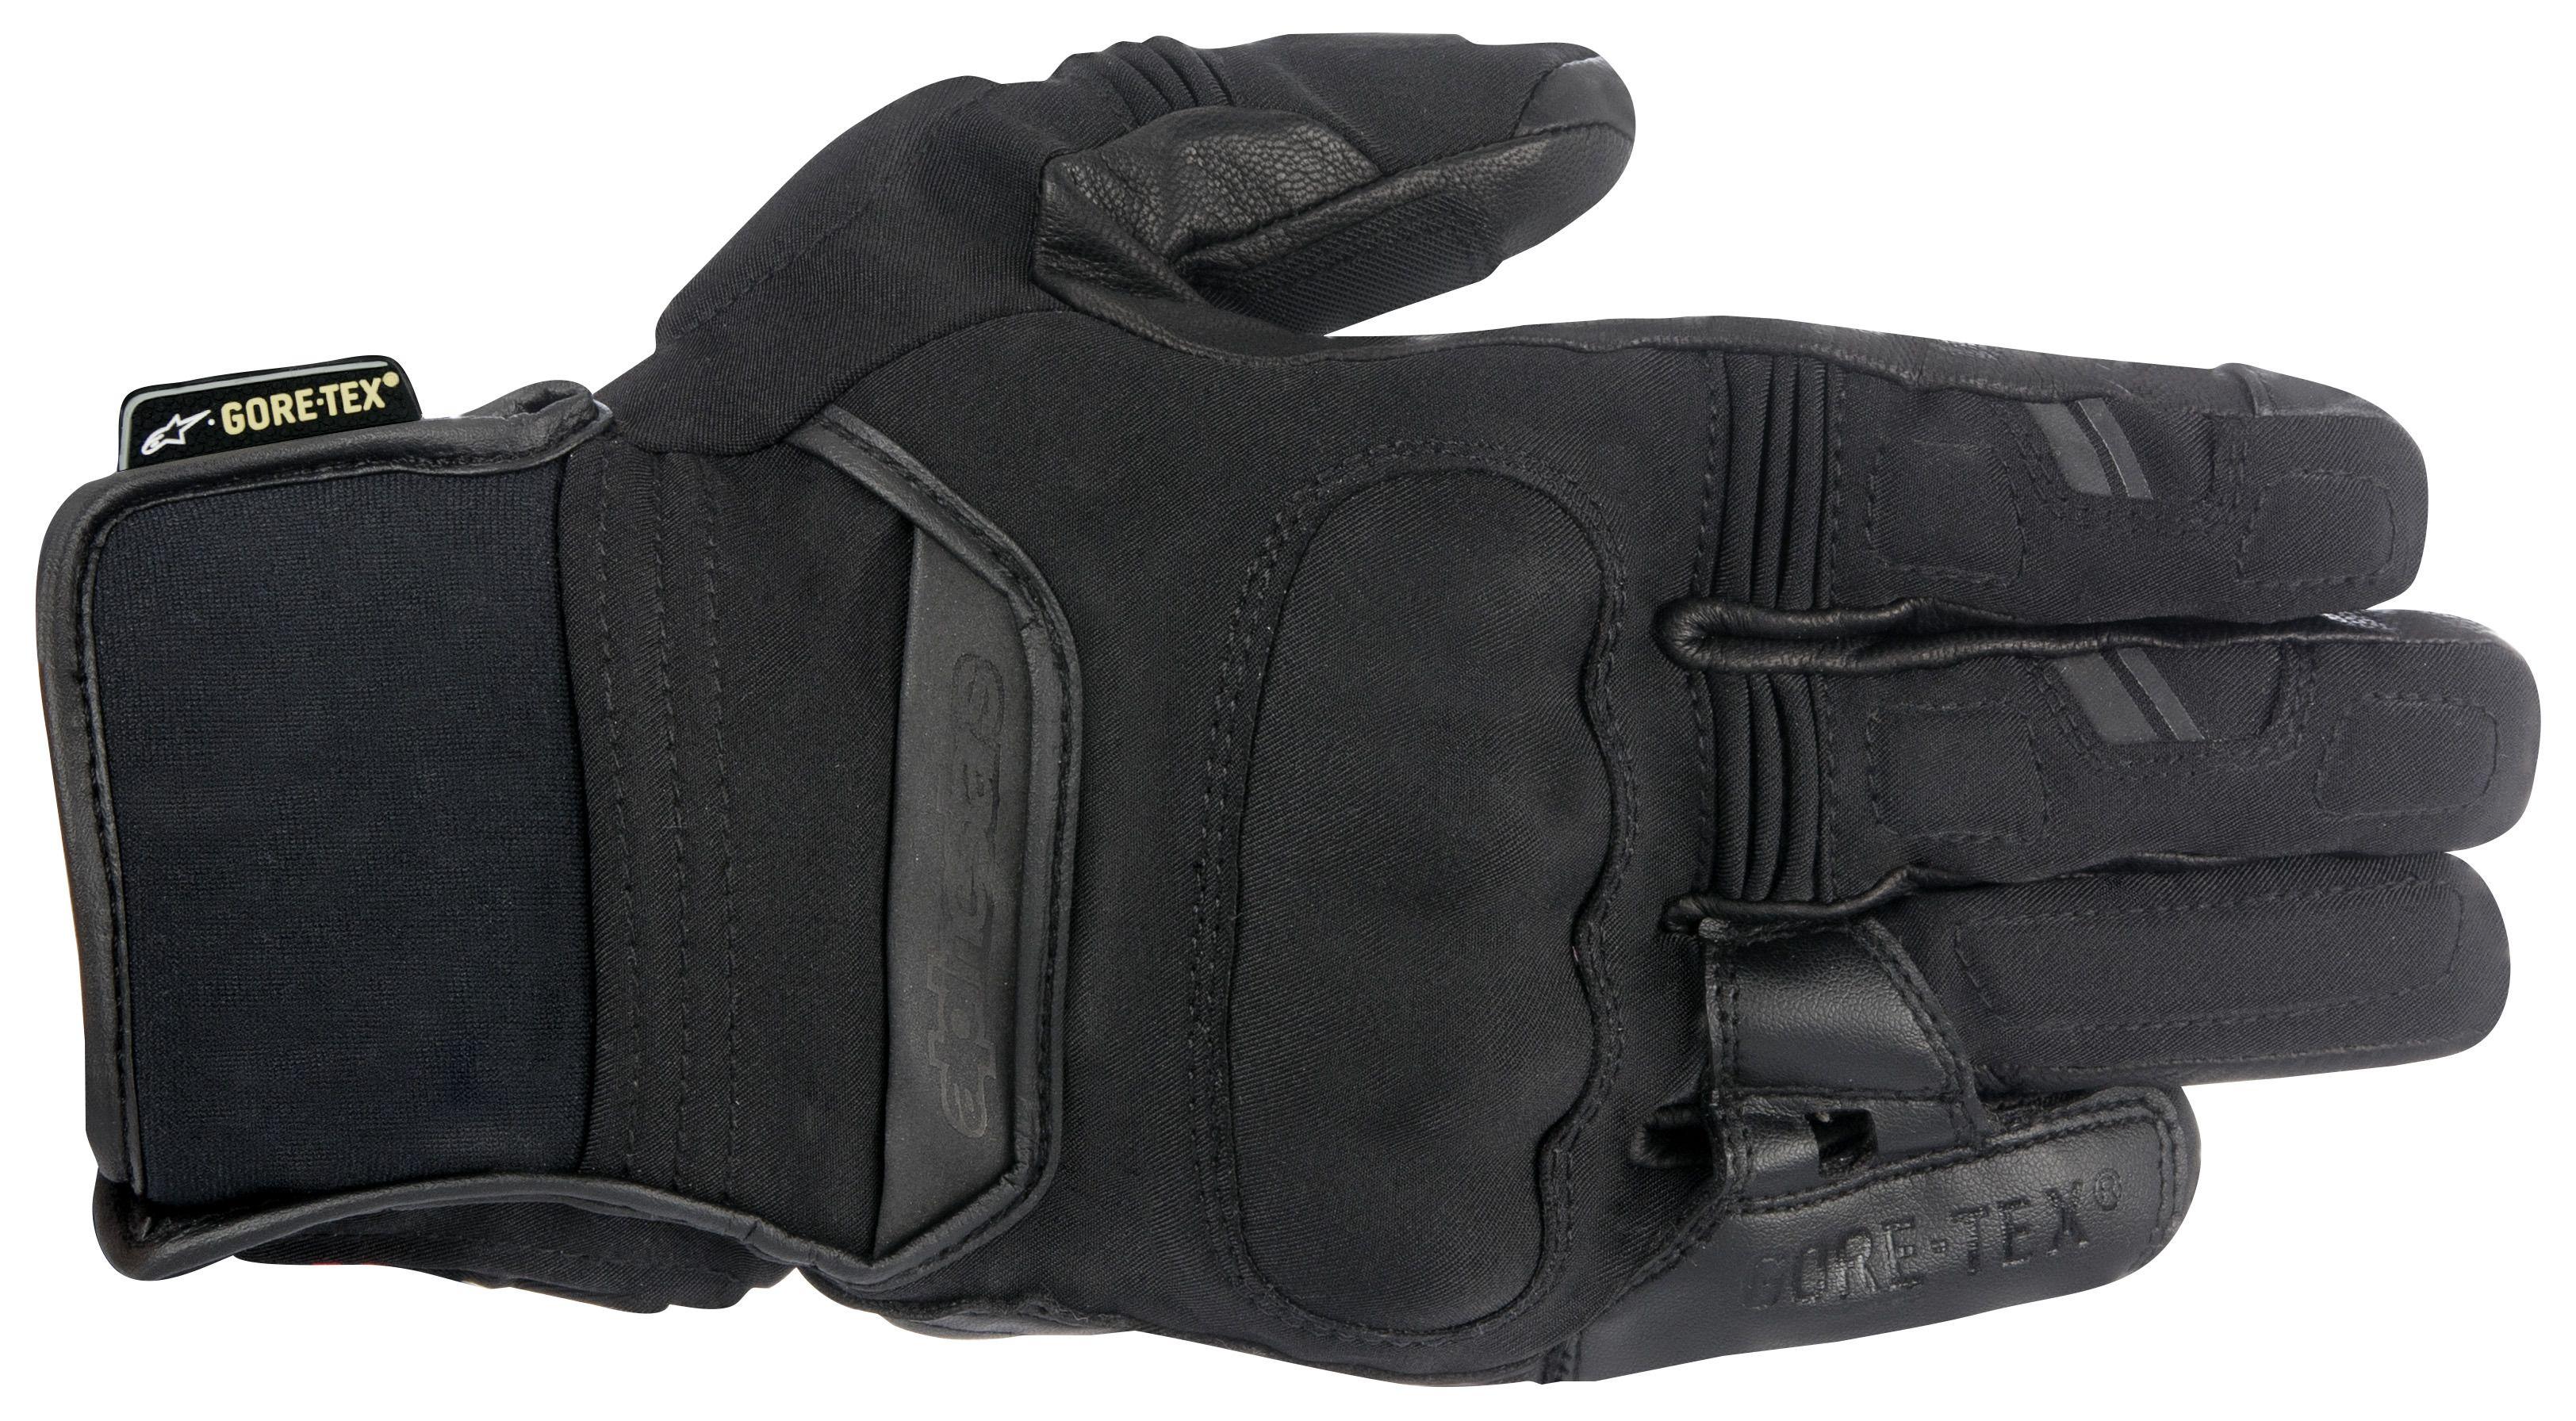 Motorcycle gloves review 2016 - Motorcycle Gloves Review 2016 16